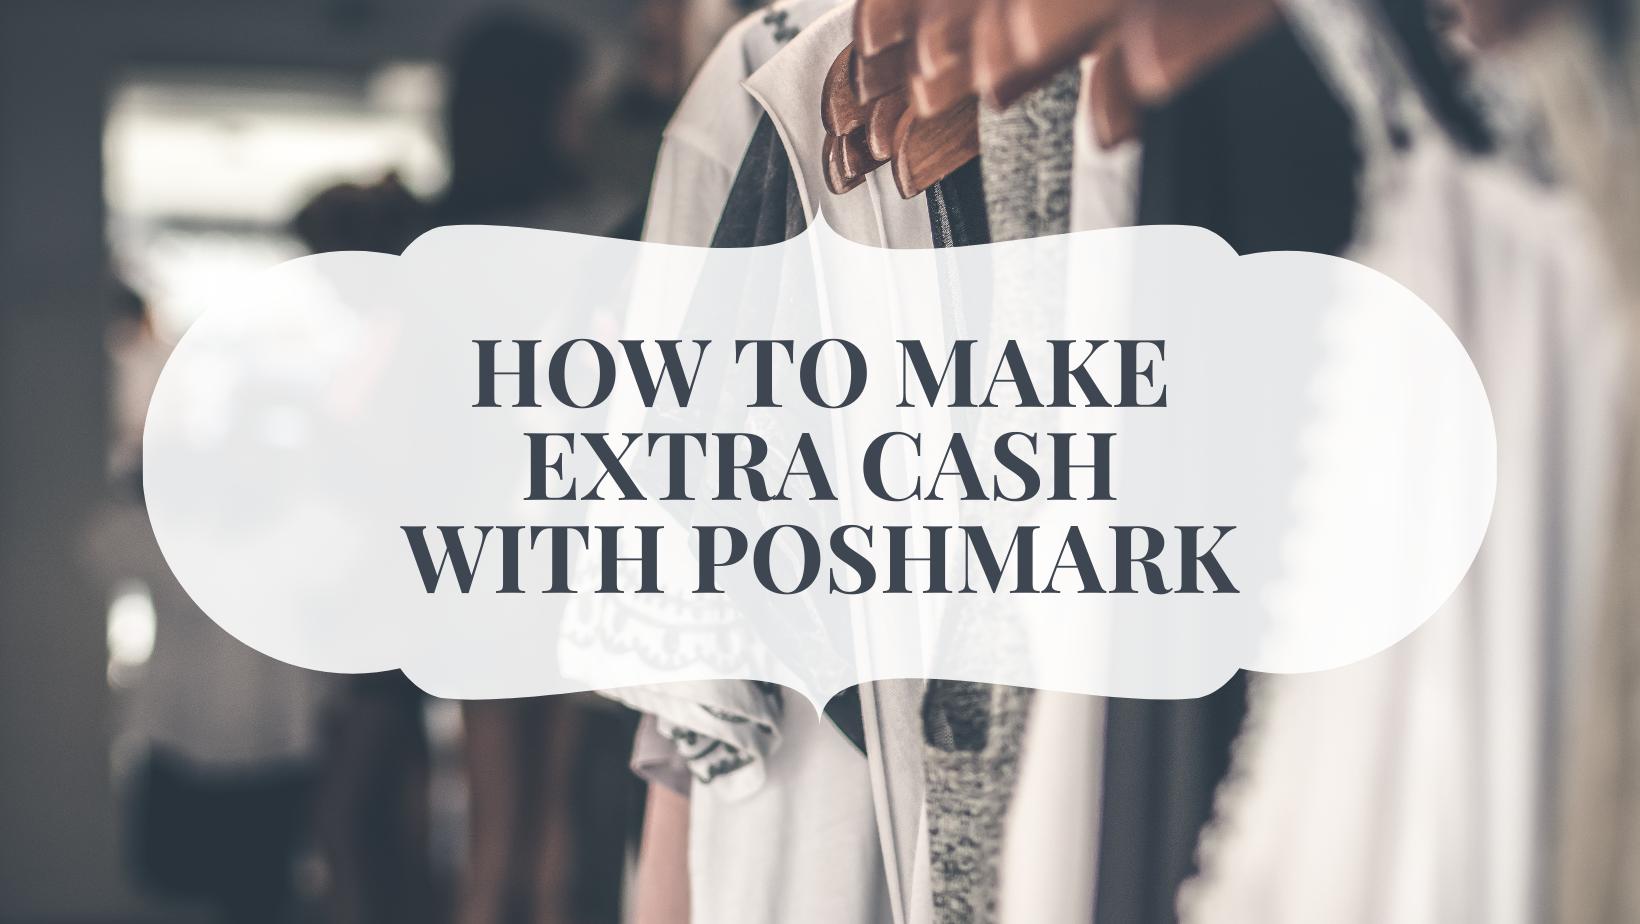 poshmark featured image